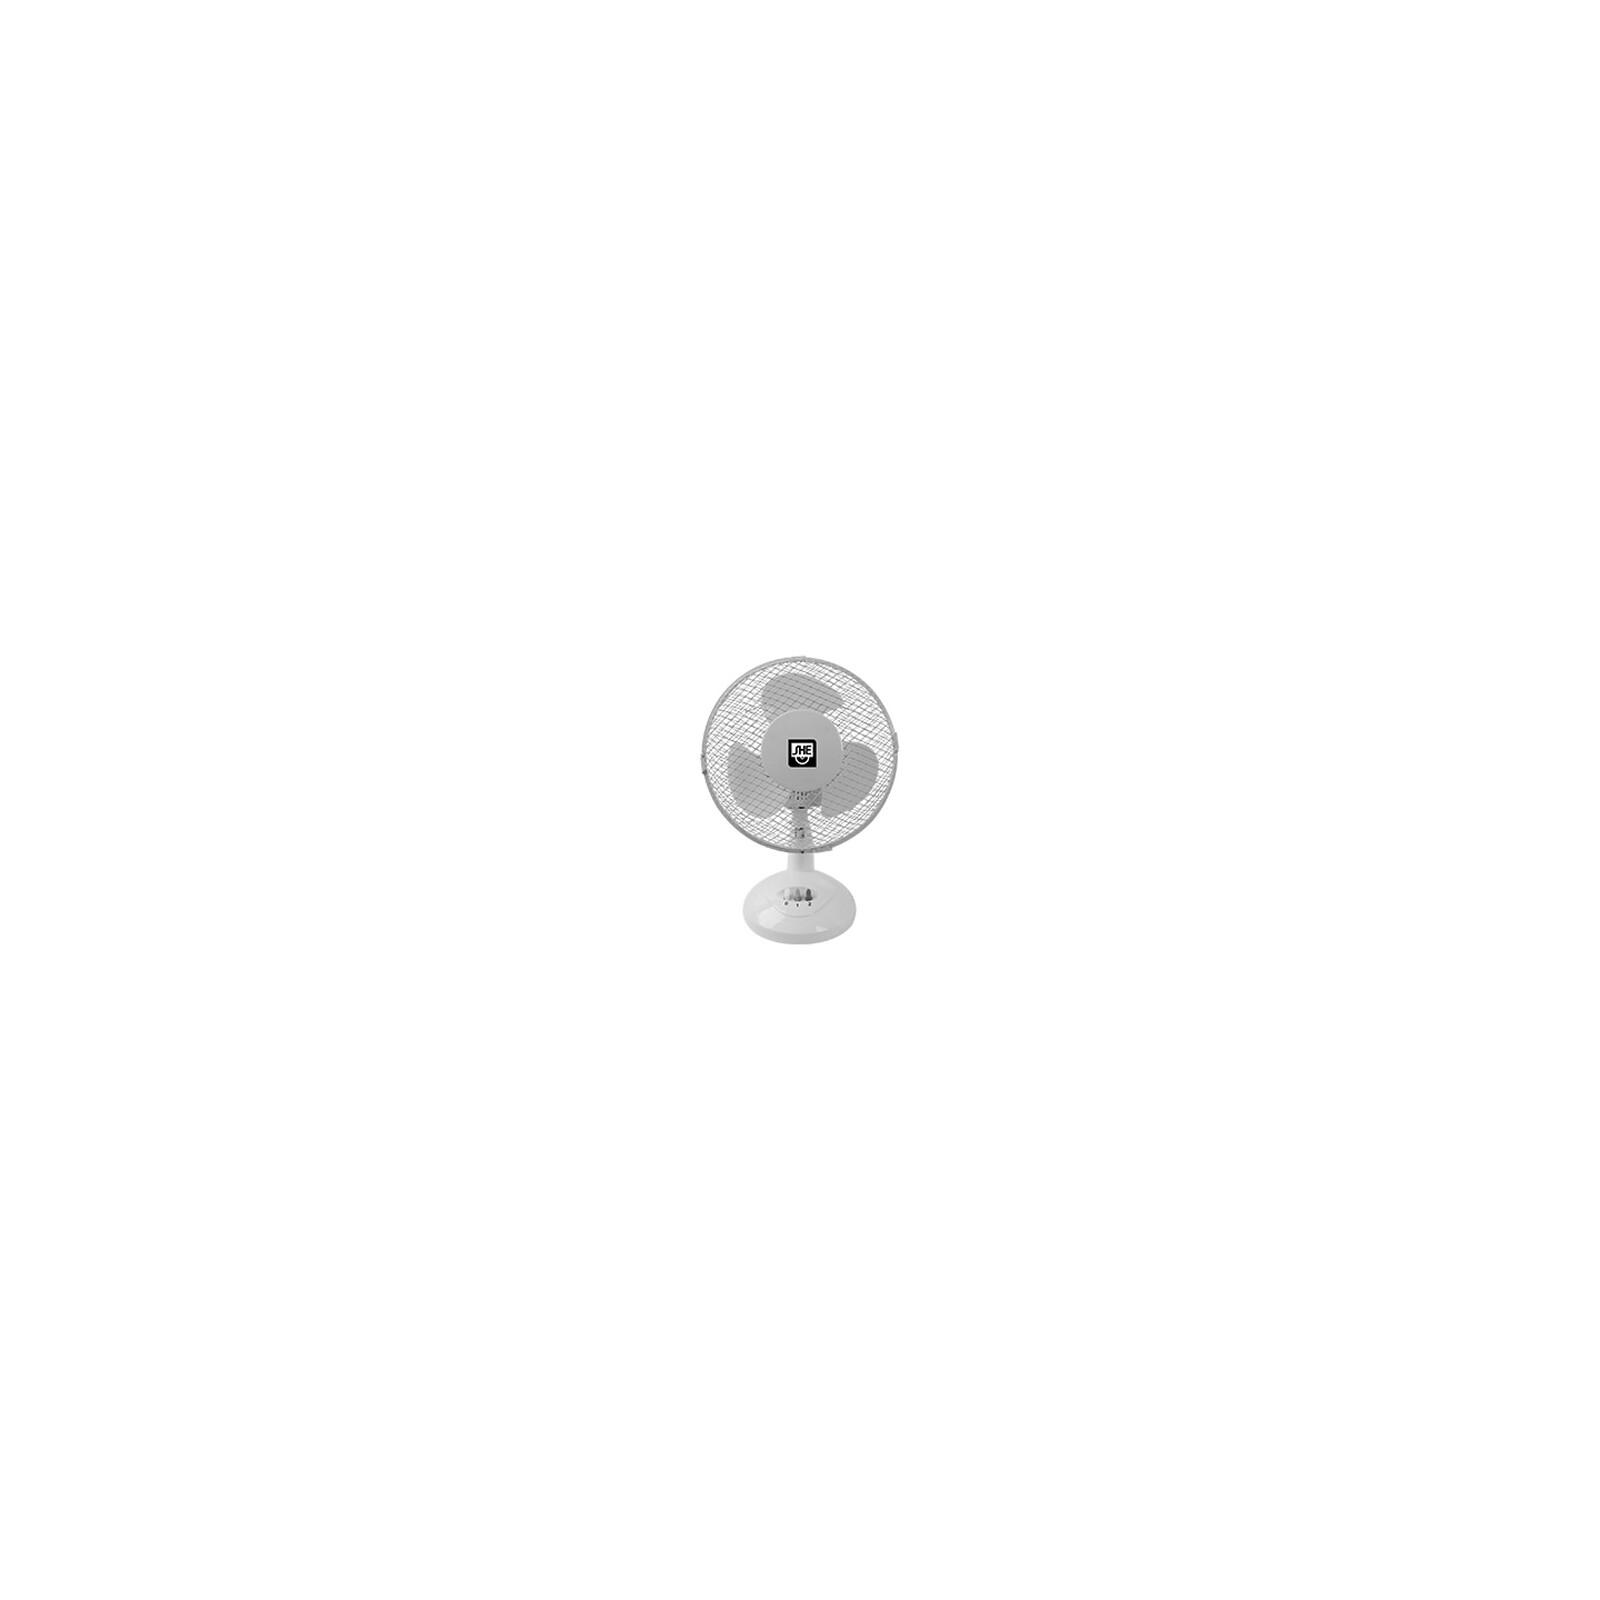 SHE Tischventilator SHE23TI1901 23cm